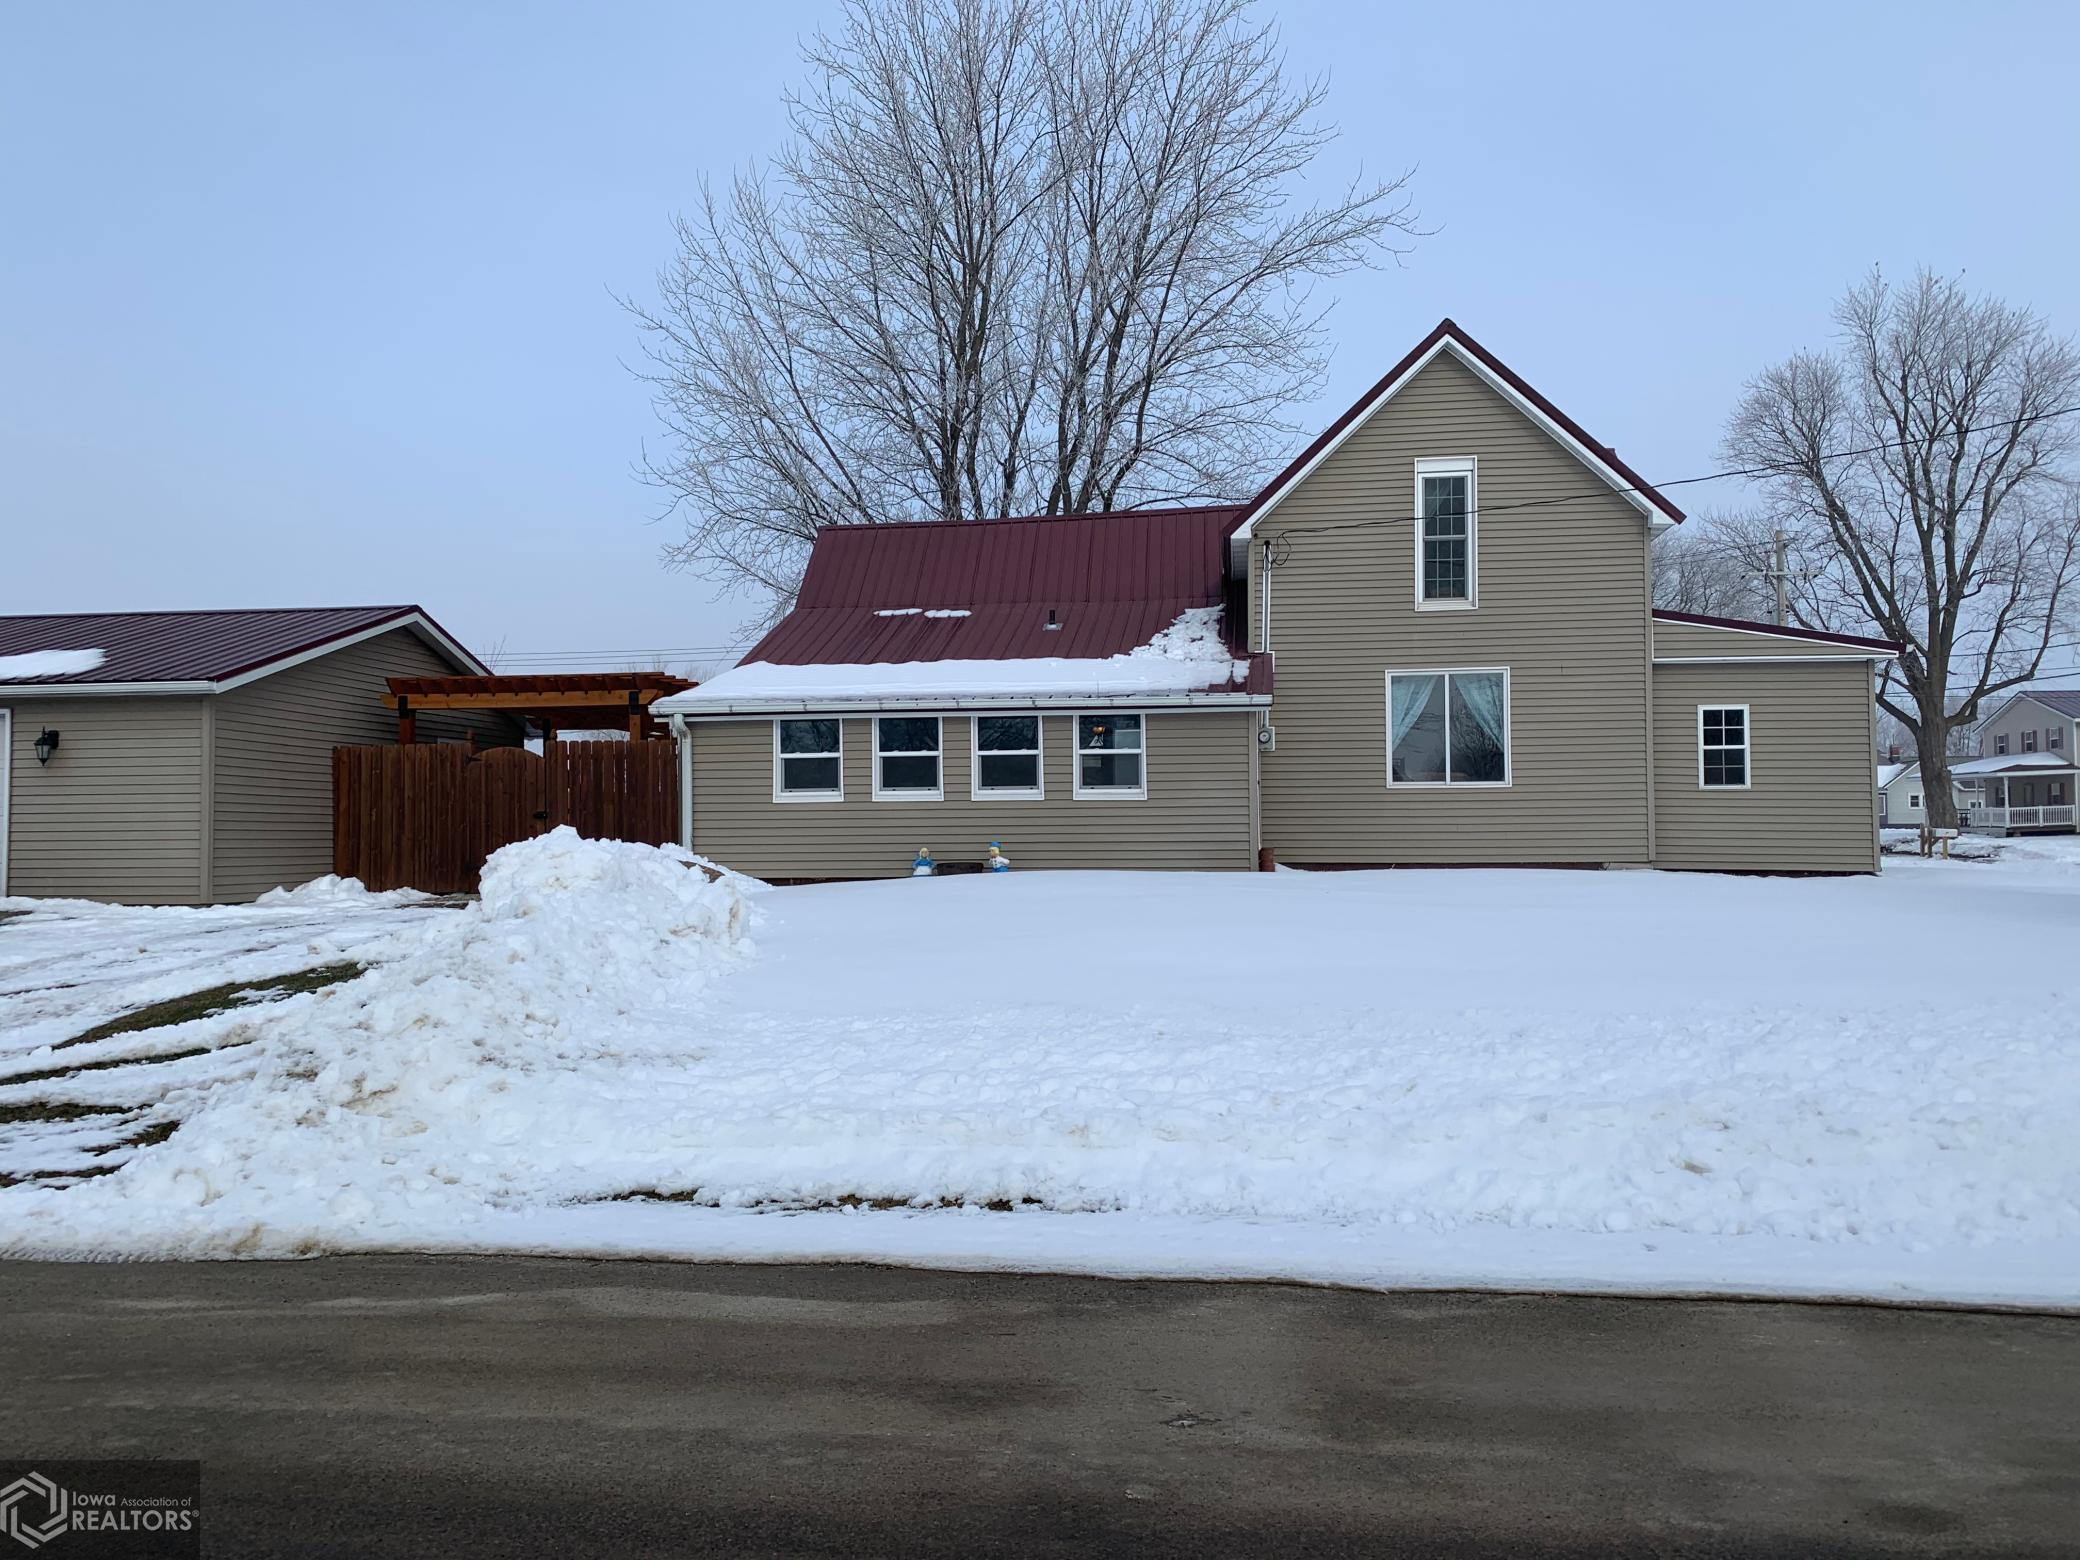 506 3rd, Montezuma, Iowa 50171-0355, 4 Bedrooms Bedrooms, ,1 BathroomBathrooms,Single Family,For Sale,3rd,5703999